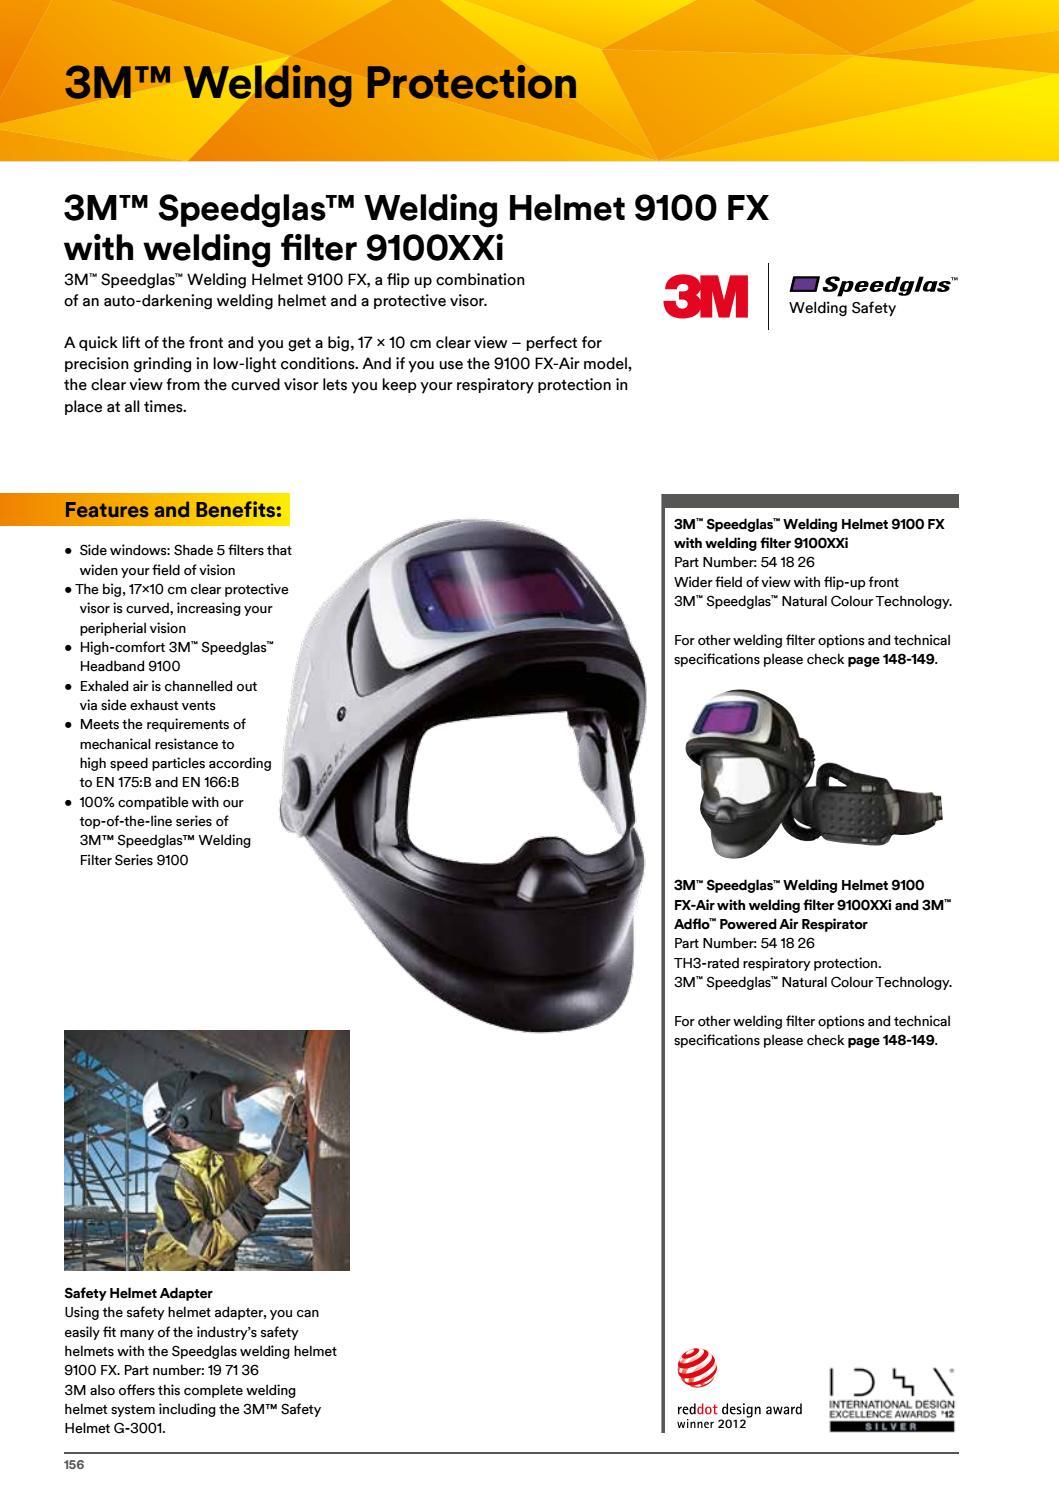 Speedglass Adflo Particle Filter Main Filter 9100